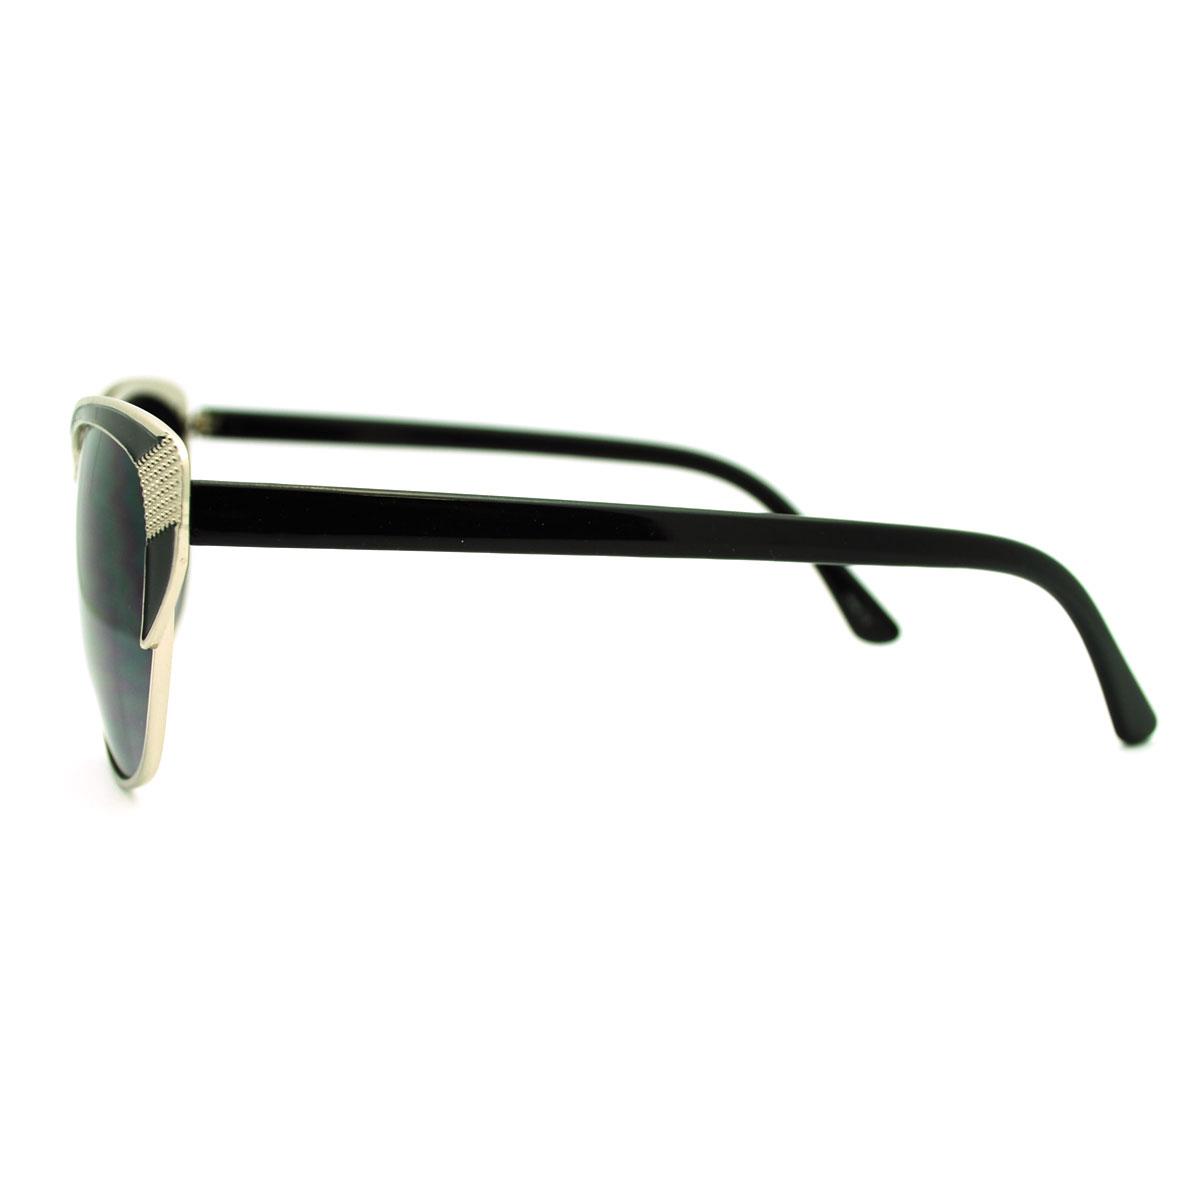 White Half Frame Glasses : Retro Metal Frame Cat Eye Half Rim Sunglasses - White eBay